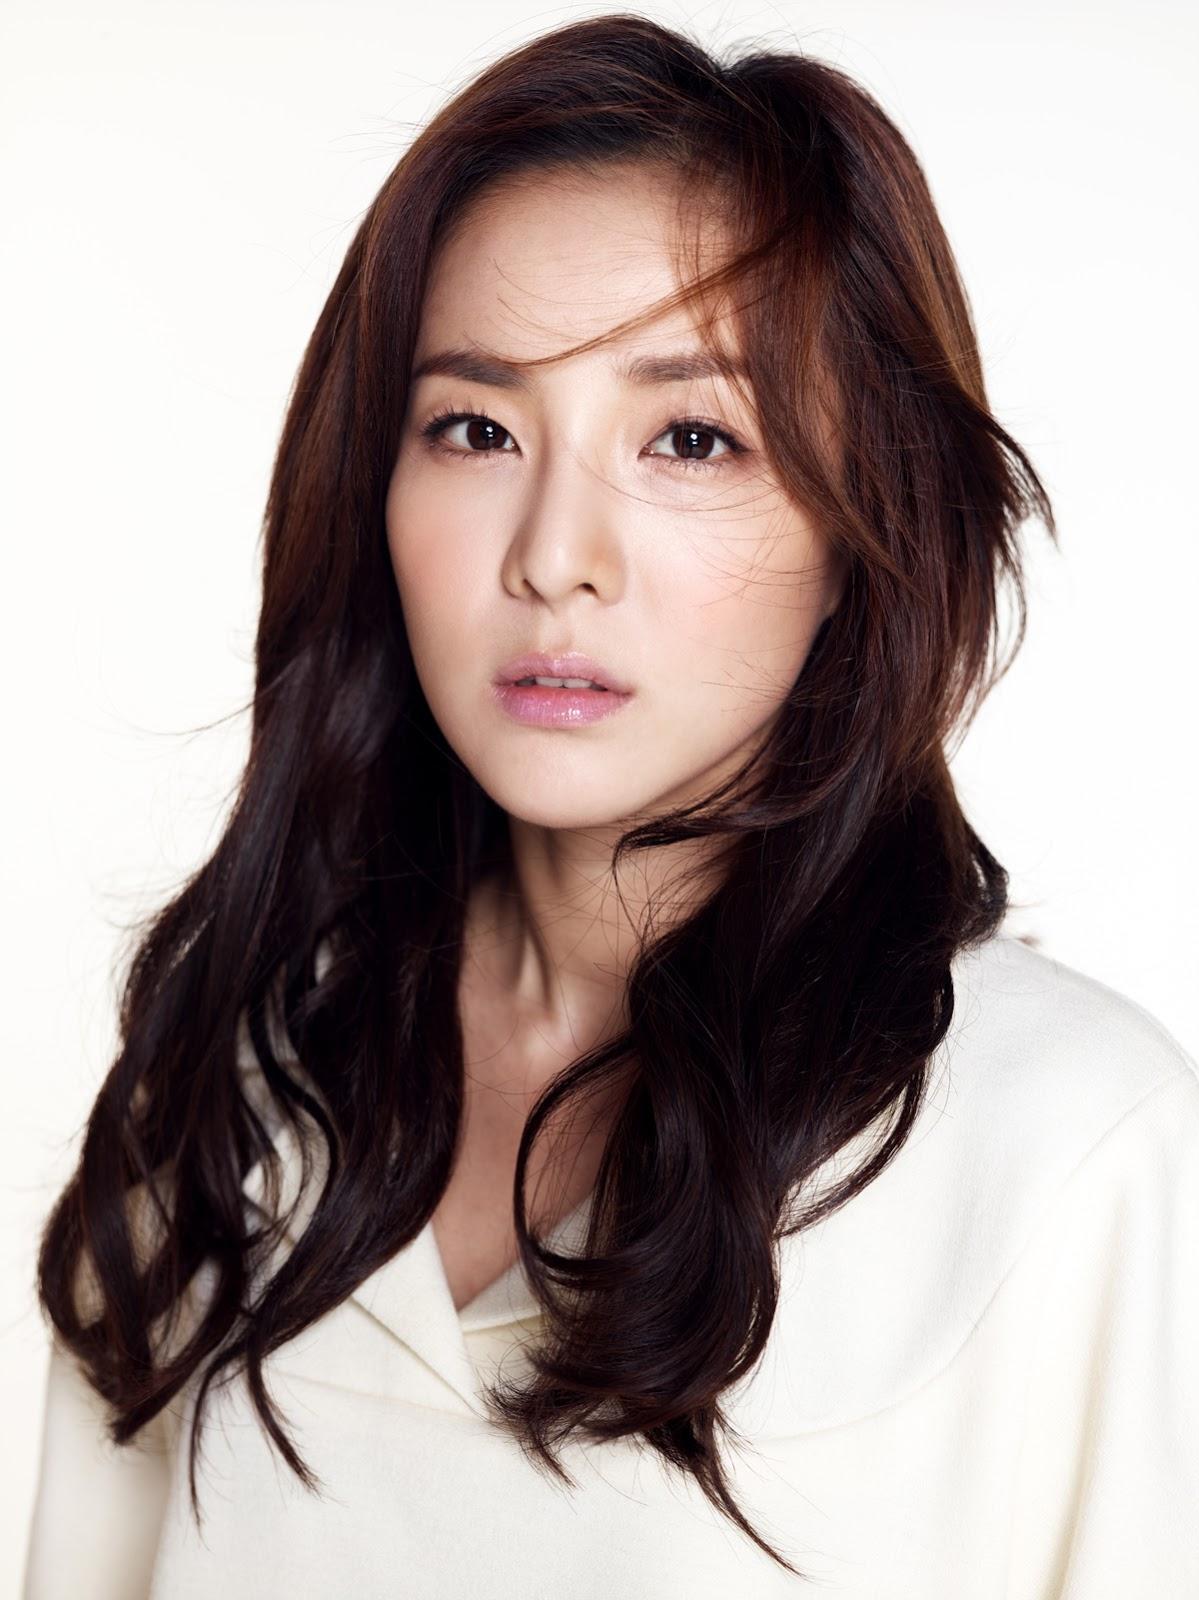 2NE1s Sandara Park Considered as Jun Jihyun in the web